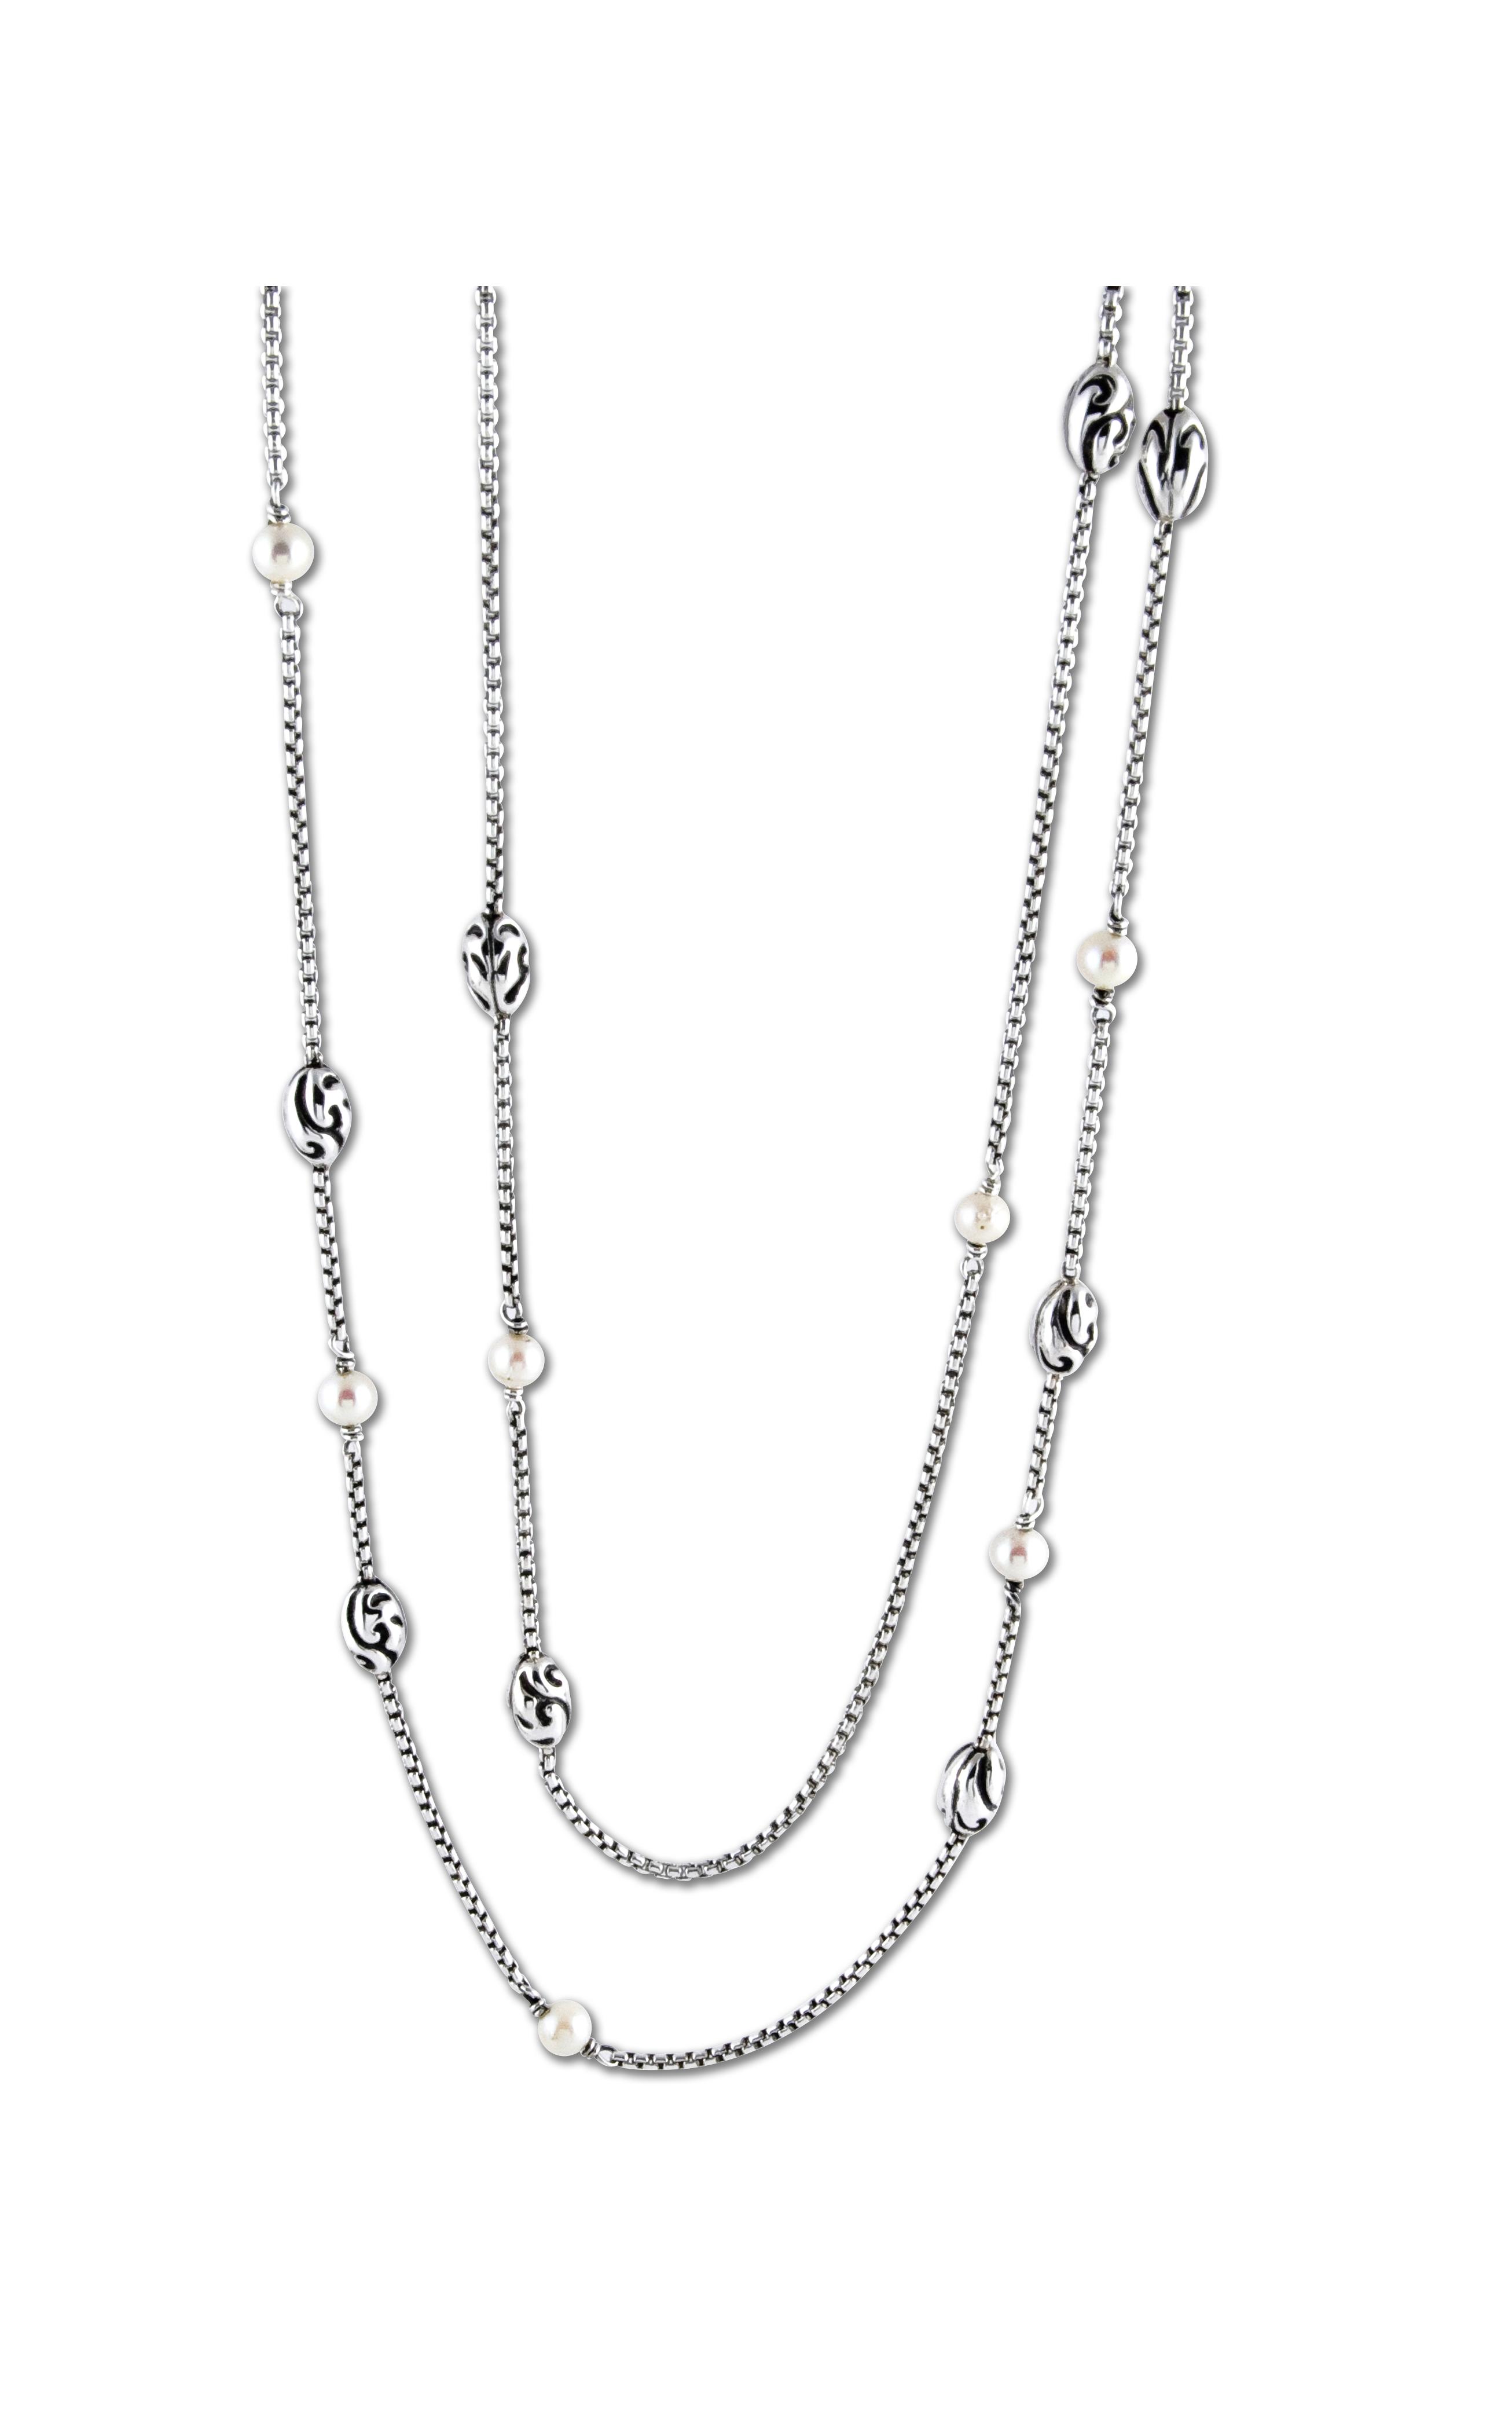 Zina Swirl Necklace A1233-51-PR product image